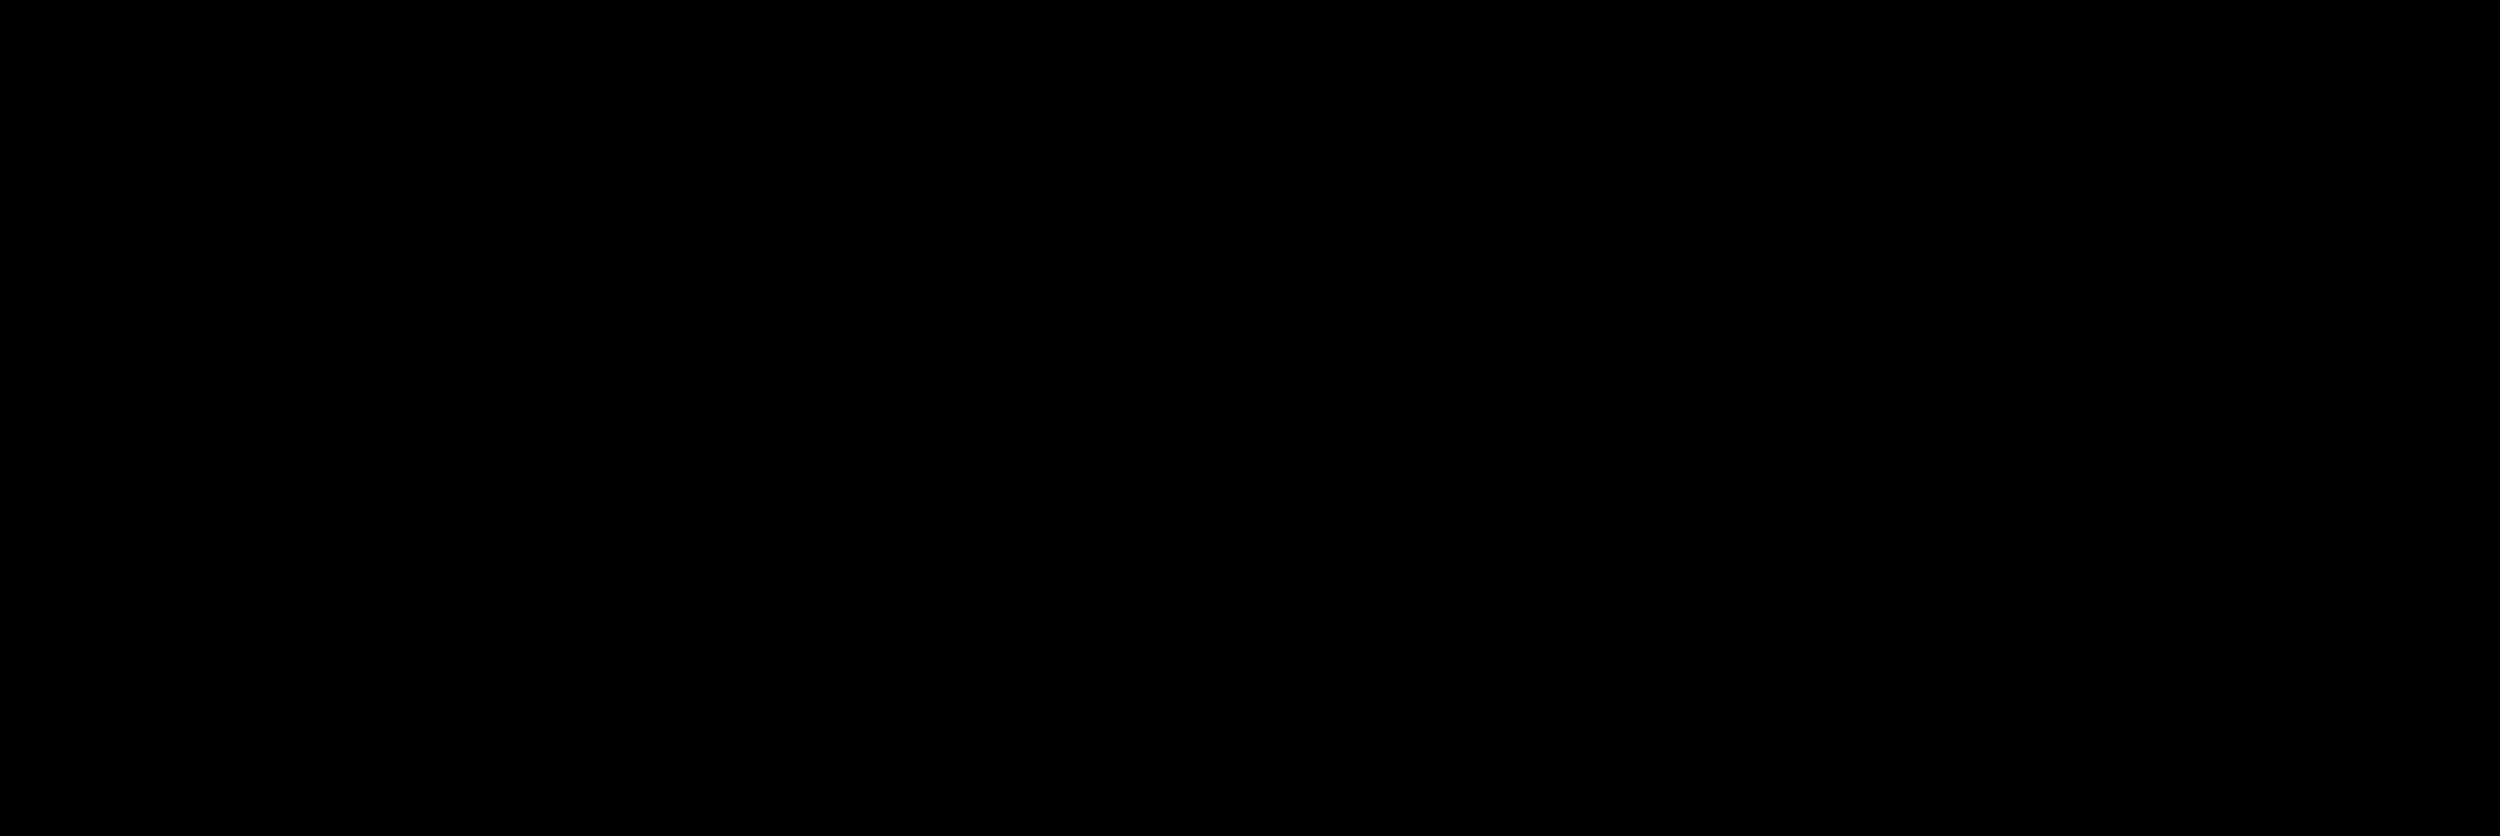 ADAY_Logo_Black